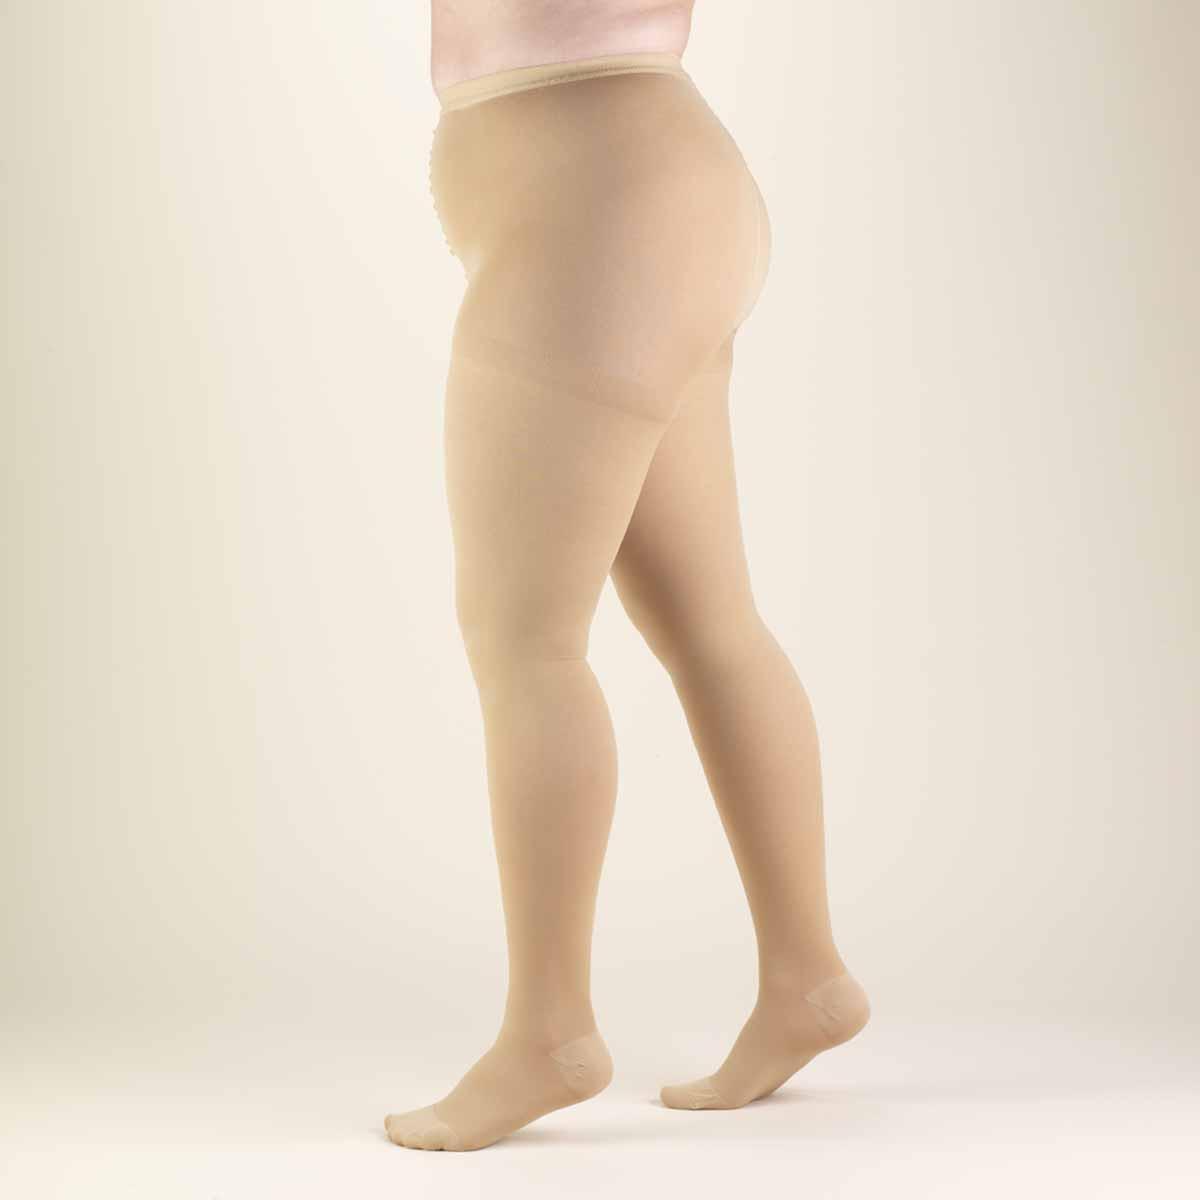 1a05f2cc8c6 TRUFORM Classic Medical Full Figure Compression Pantyhose 20-30 mmHg